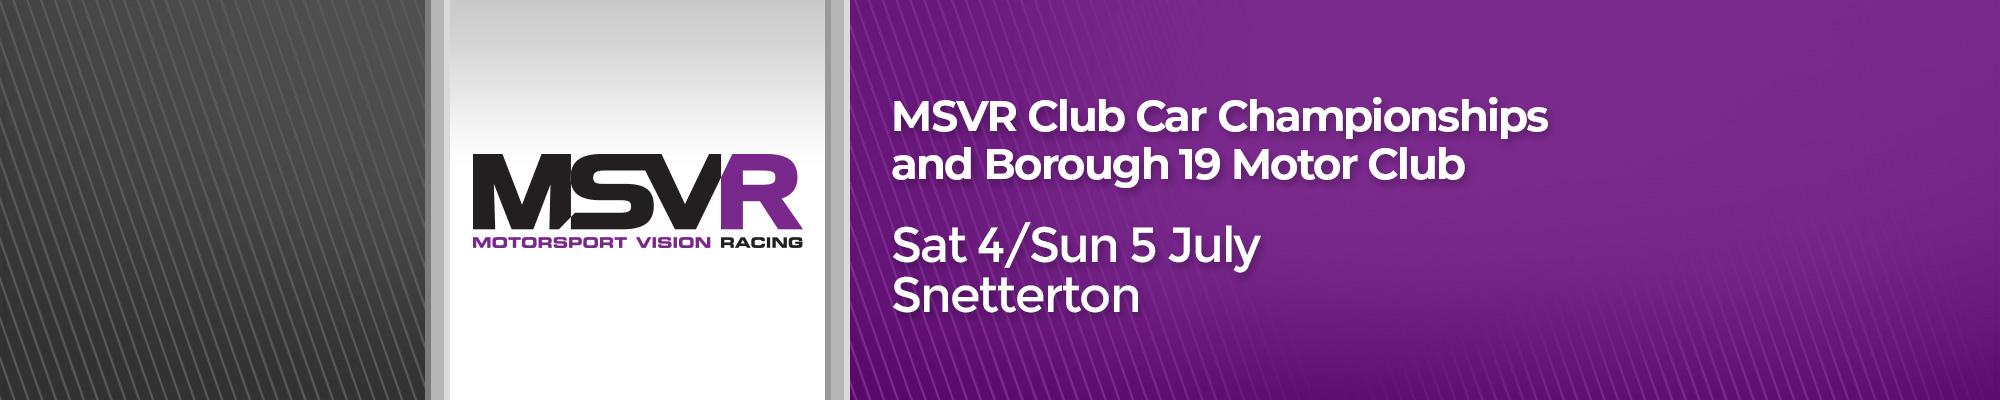 MSVR Championships (200) / Borough 19 Sprint (100)